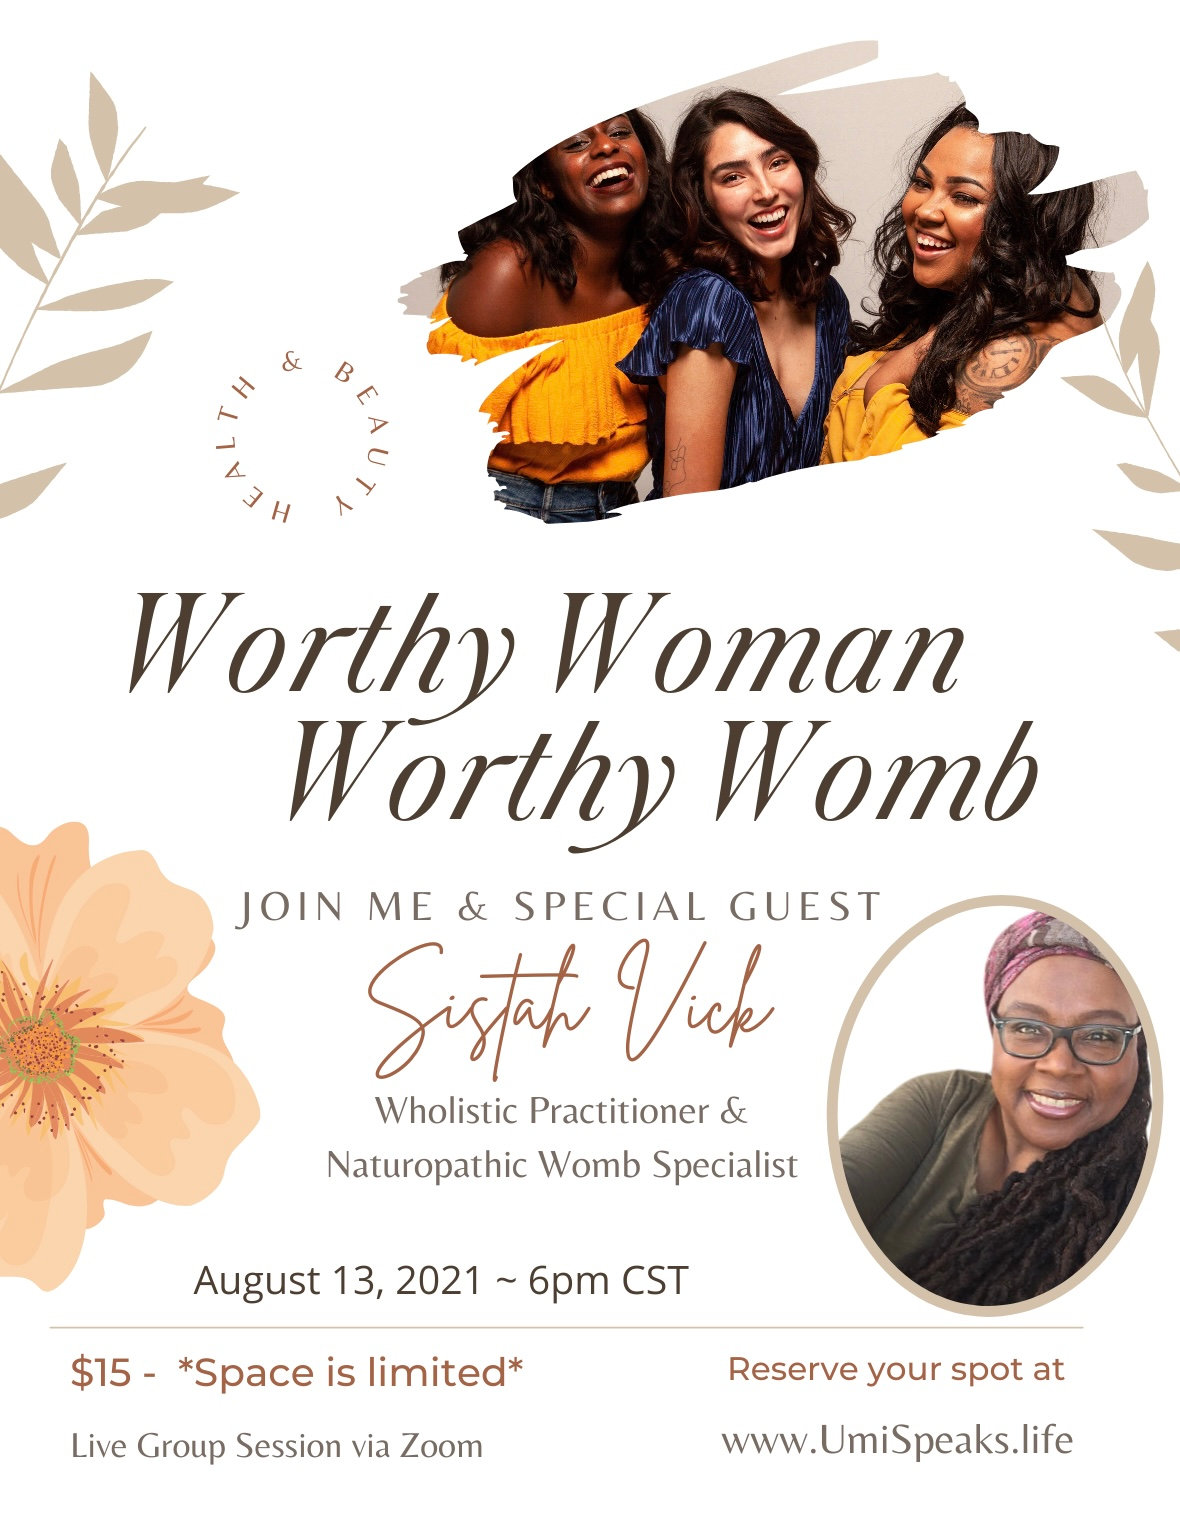 Worthy Woman, Worthy Womb